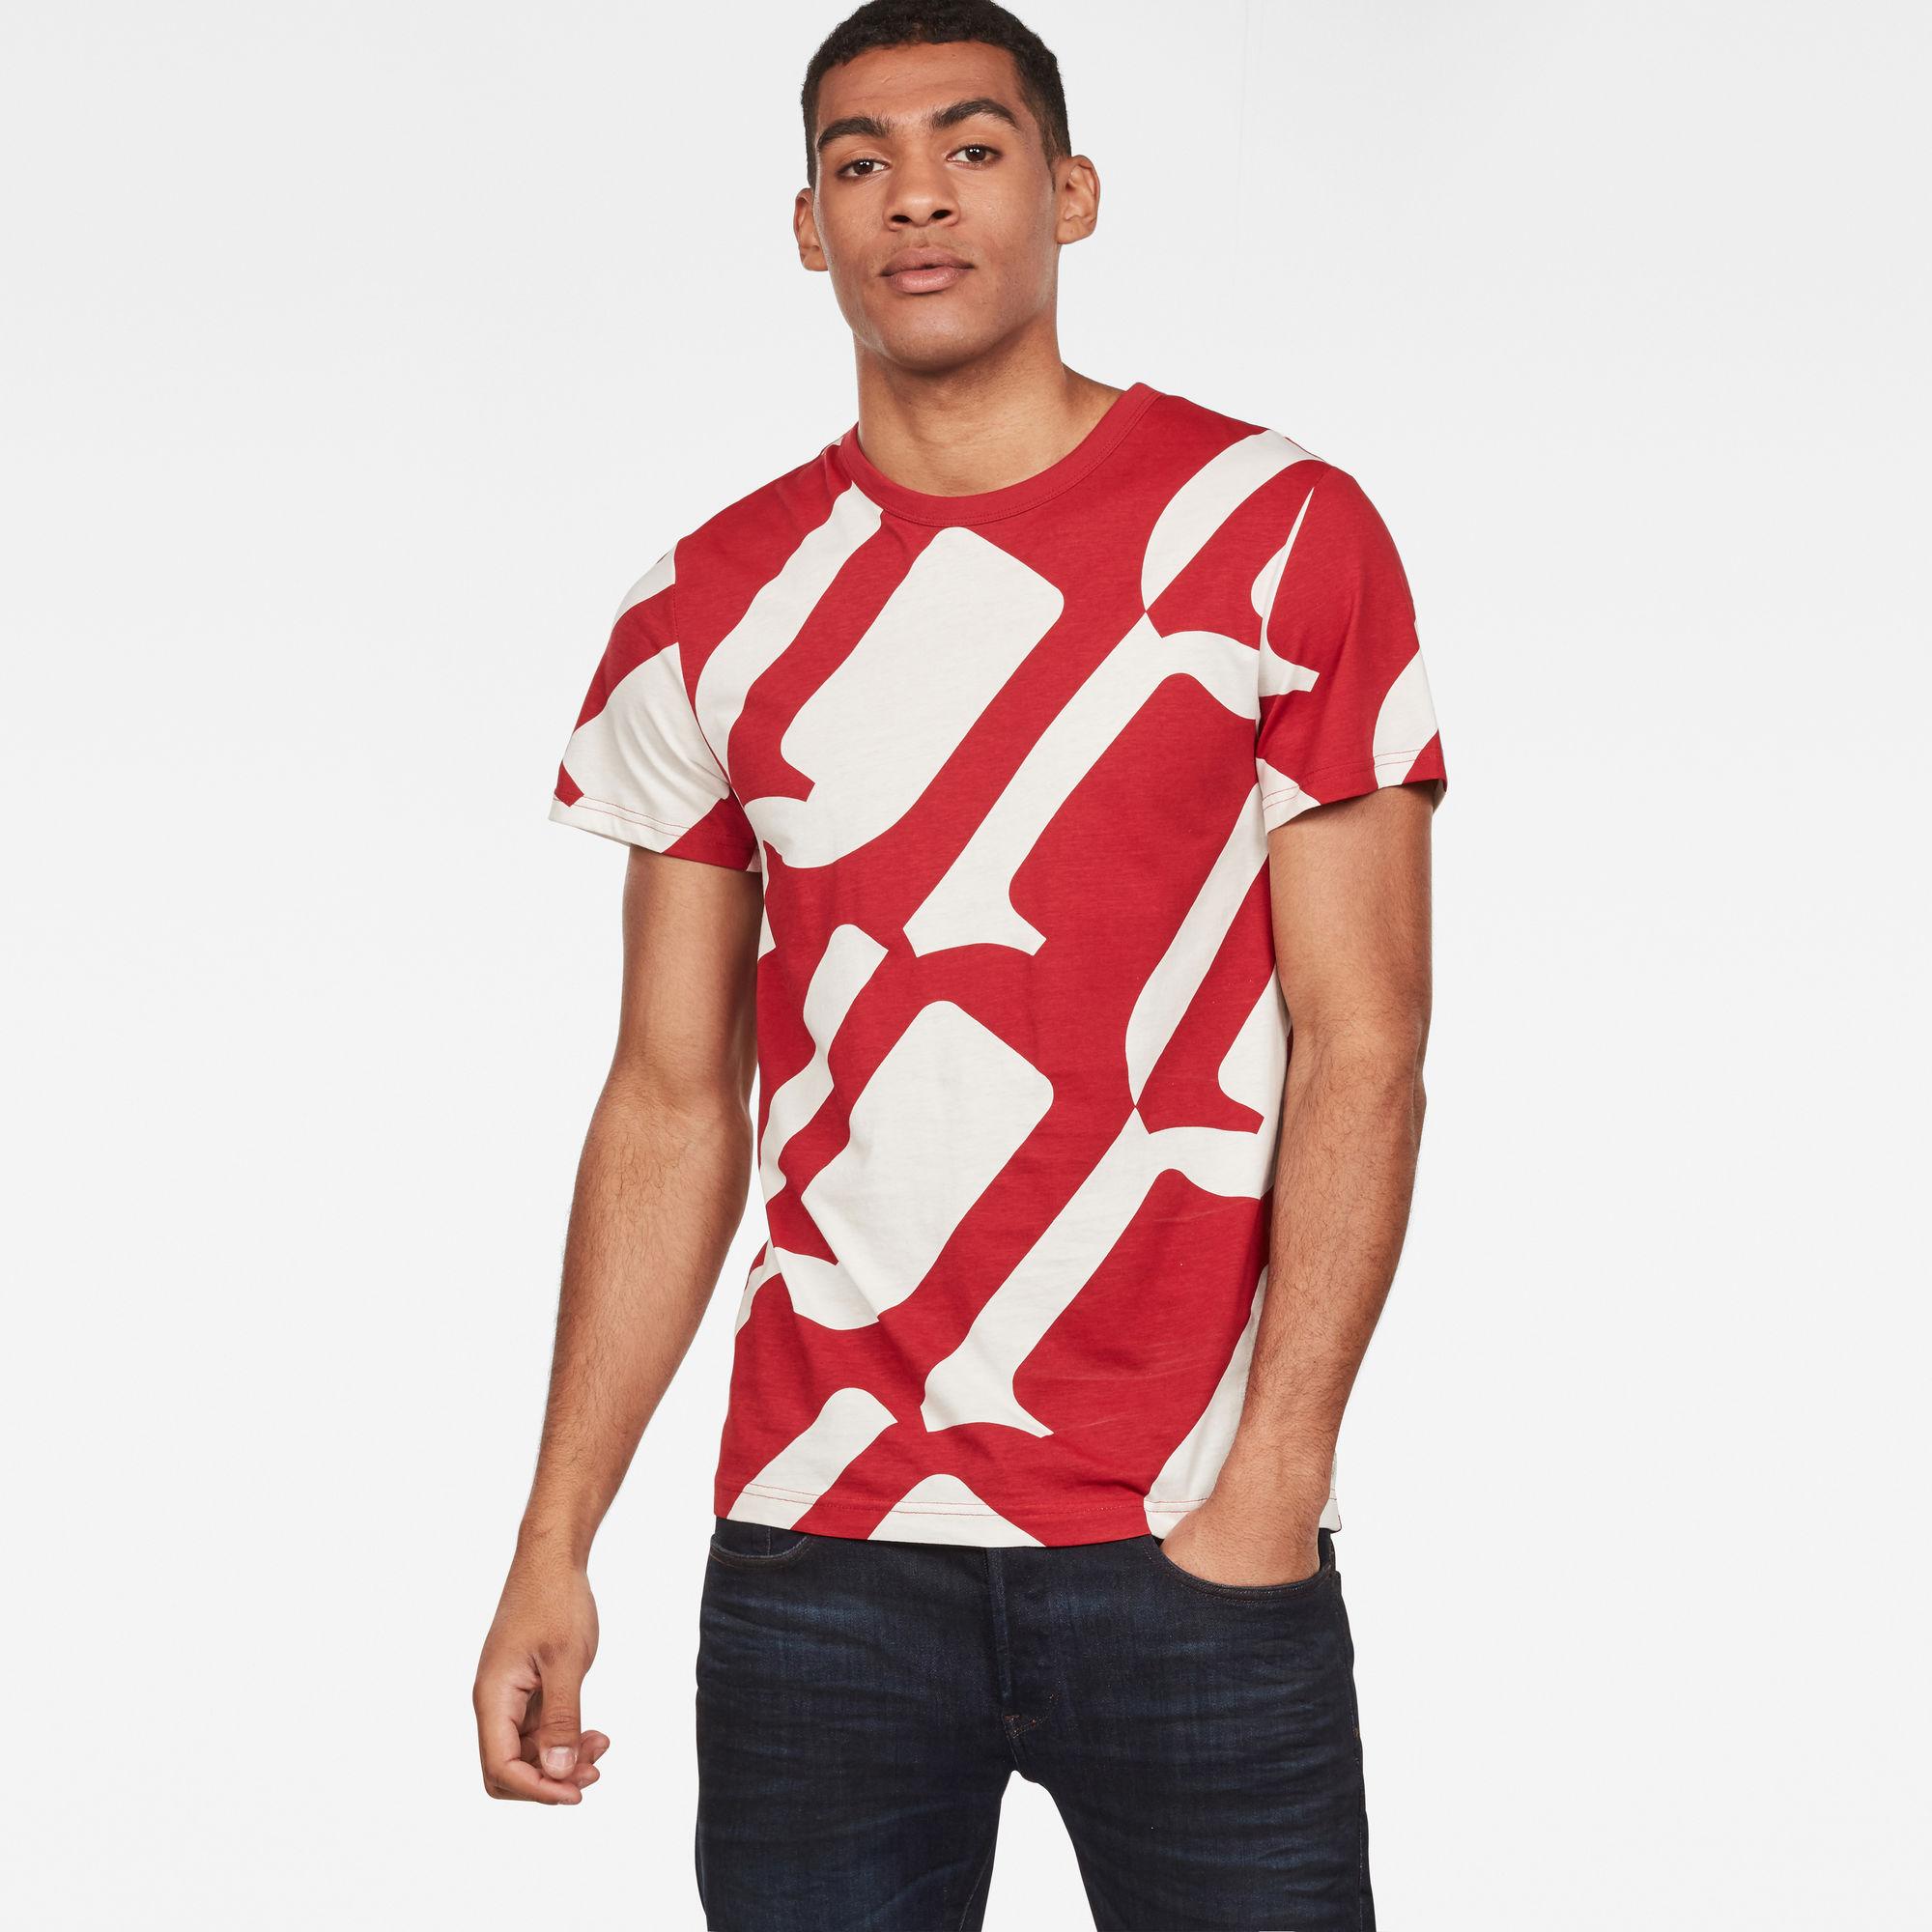 G-Star RAW Heren Hyce T-Shirt Rood